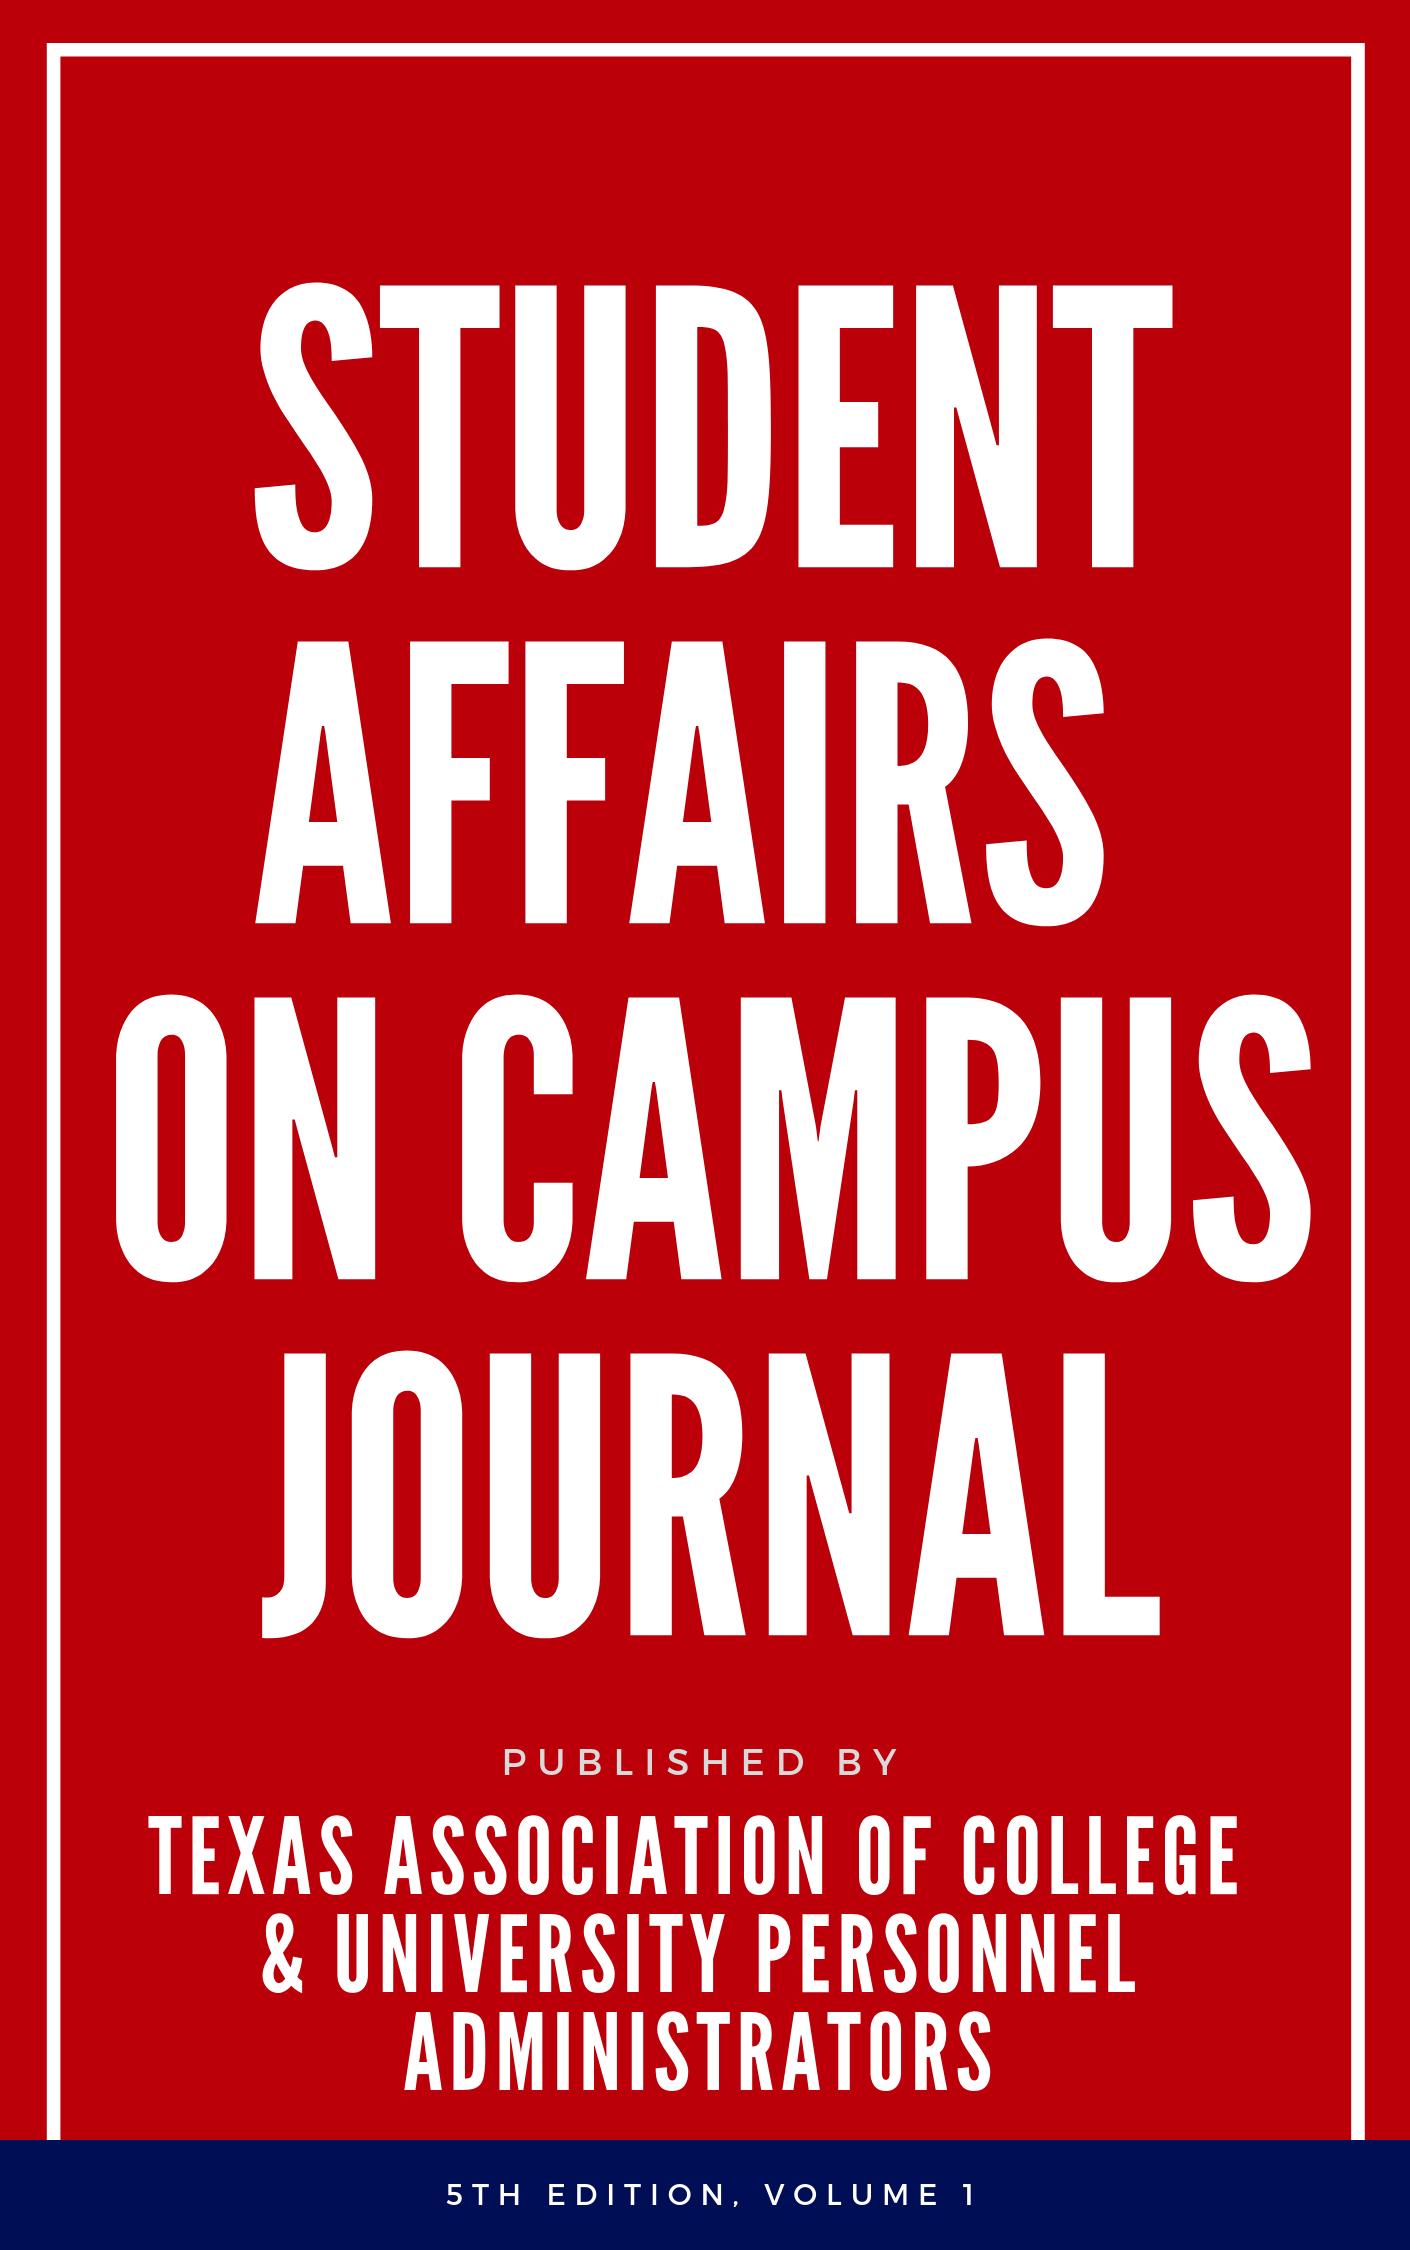 5th Edition - 2019 - Edited by: Jennifer T. Edwards, Ed.D.